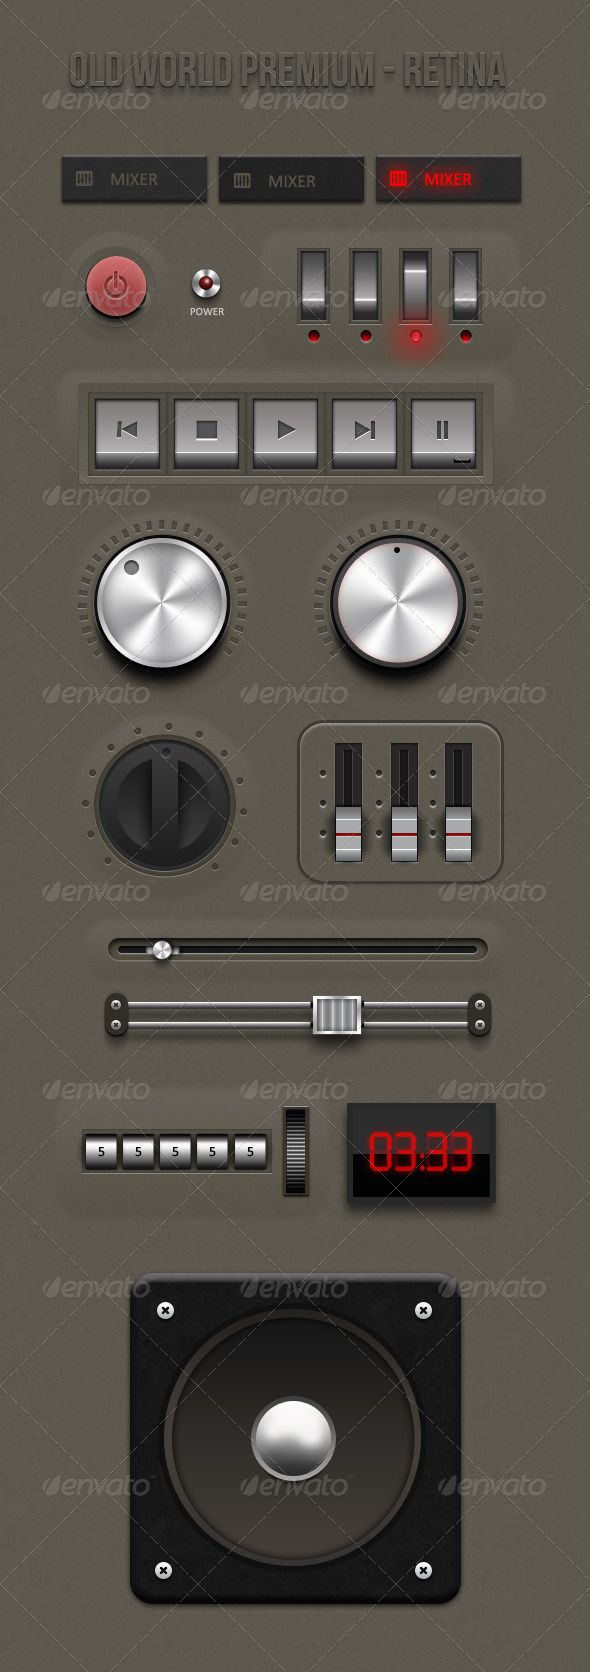 Retina - Old World Premium ui kit - GraphicRiver Item for Sale